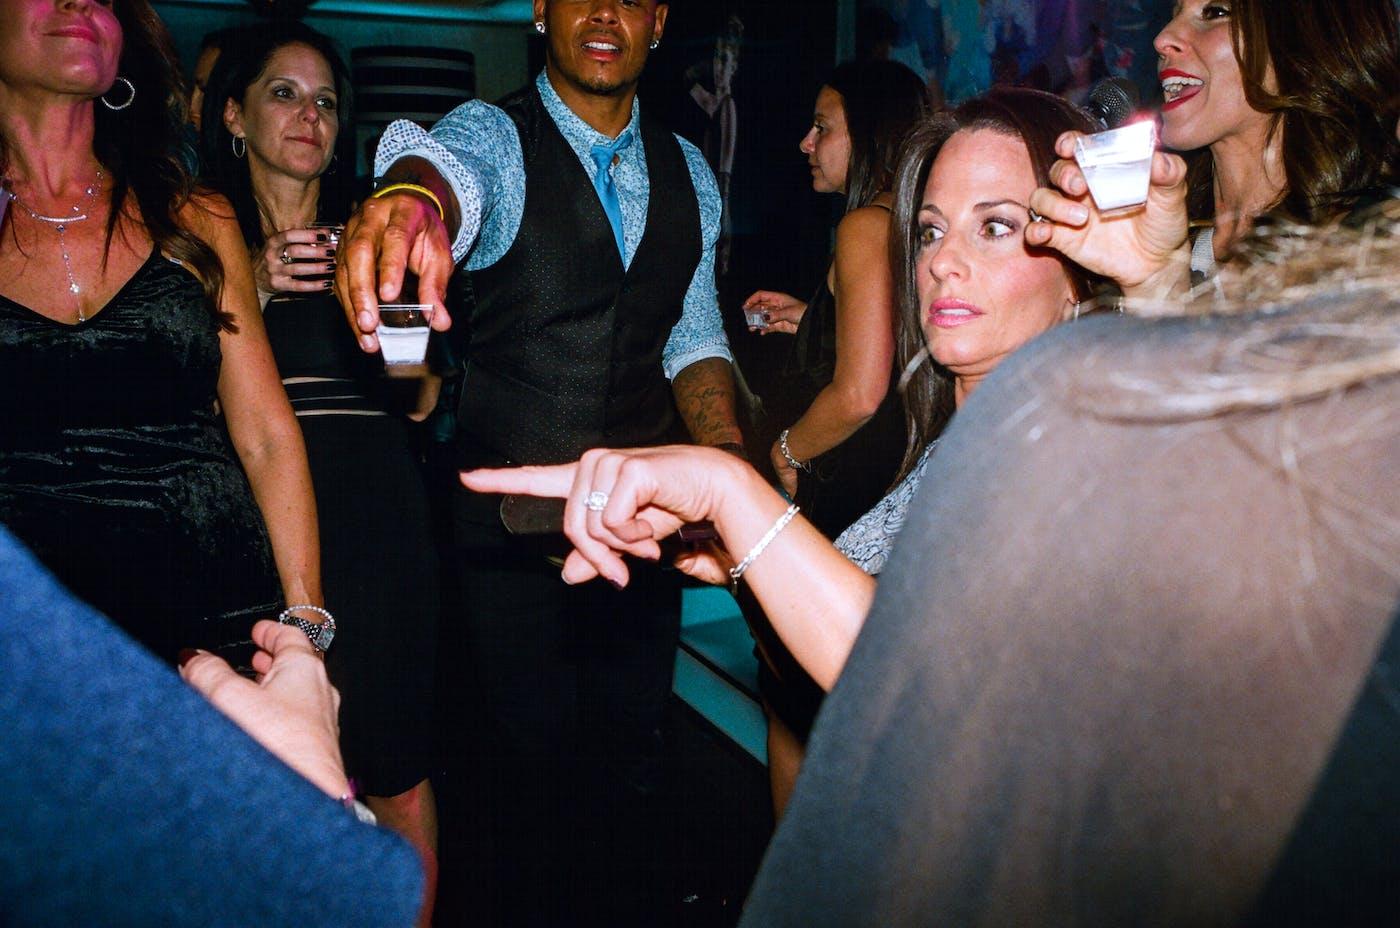 8baf81fc01ca Ricardo loosens up the adults with booze and Bon Jovi.